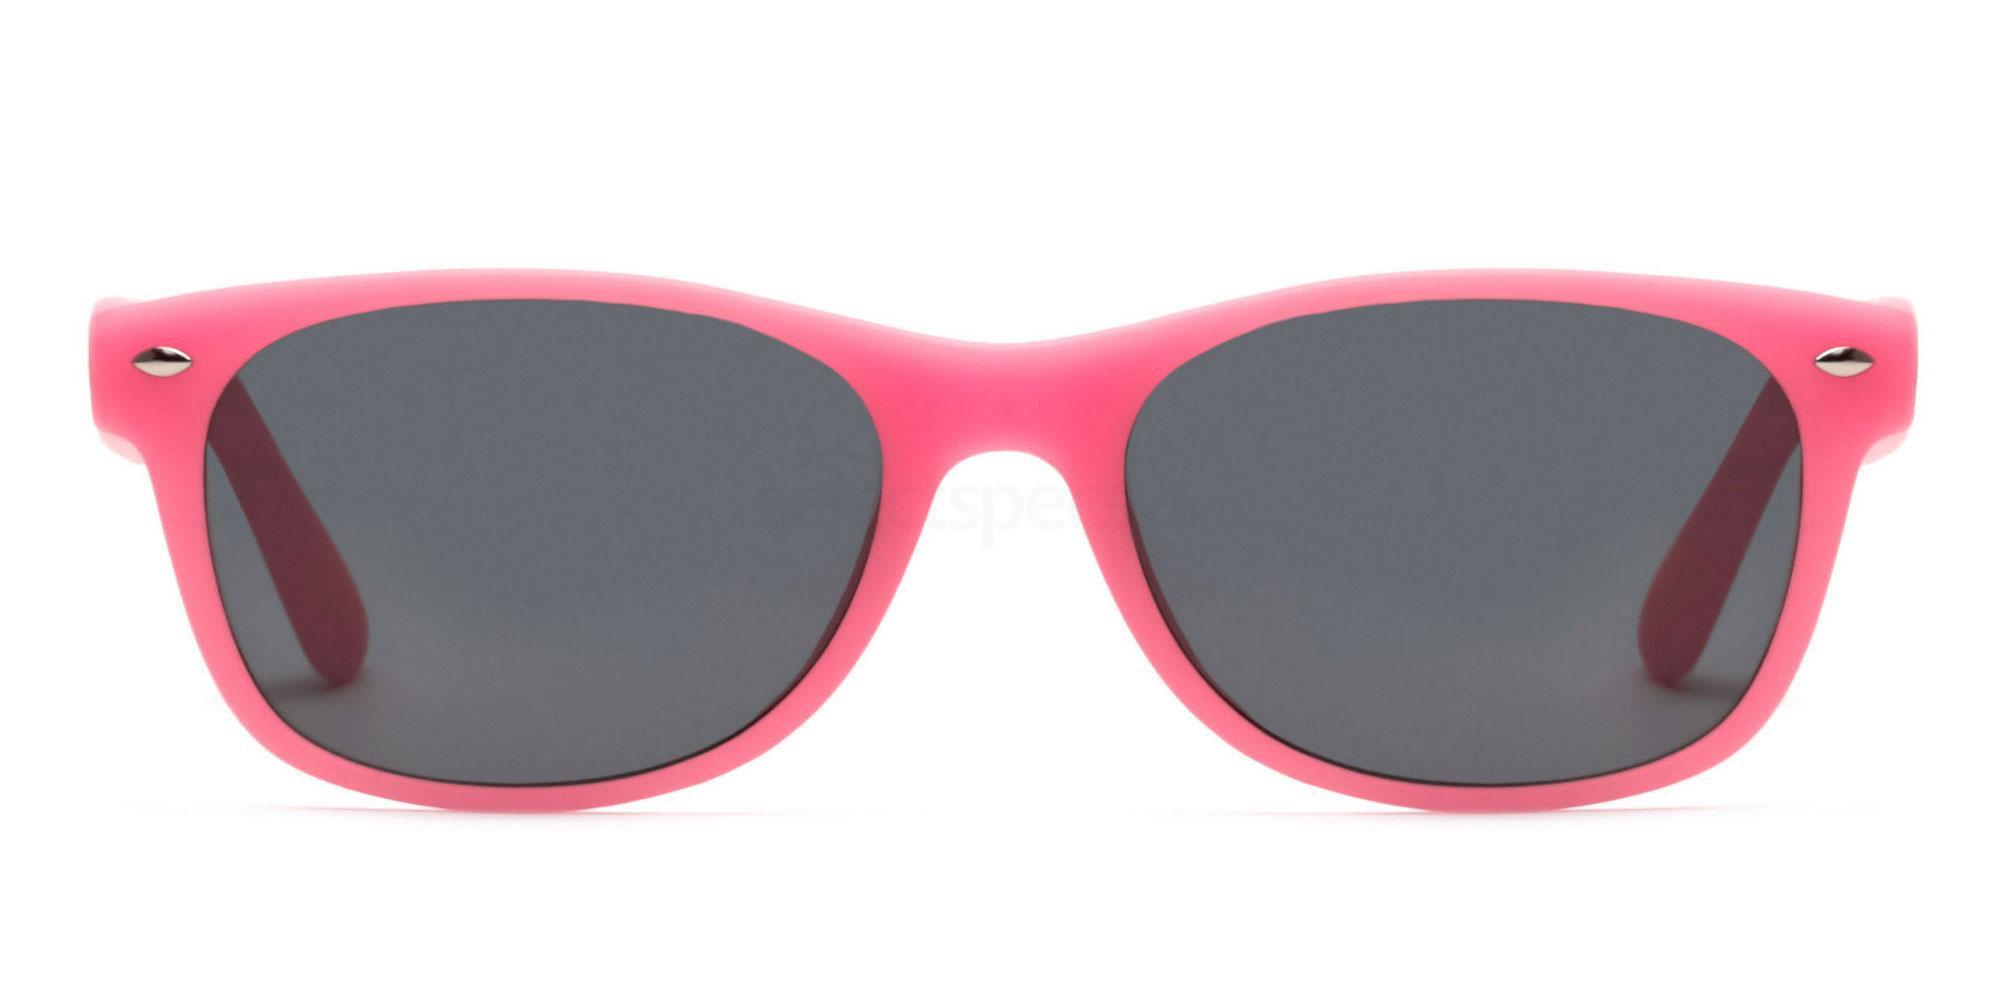 Pink S8122 - Pink (Sunglasses) Sunglasses, Savannah